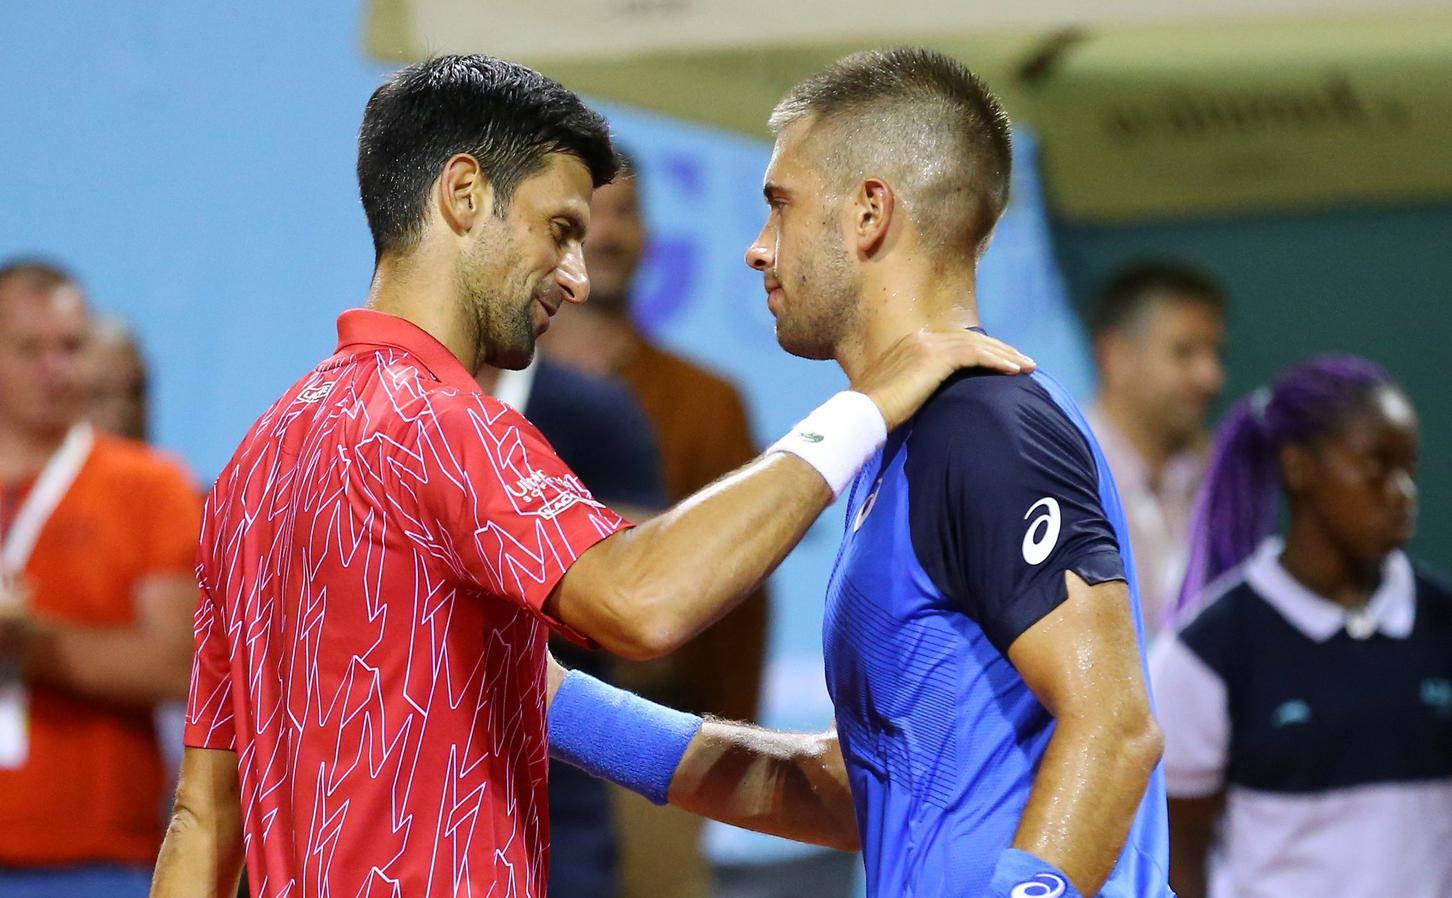 Serbia's Novak Djokovic greets with Croatia's Borna Coric after winning his match in Zadar